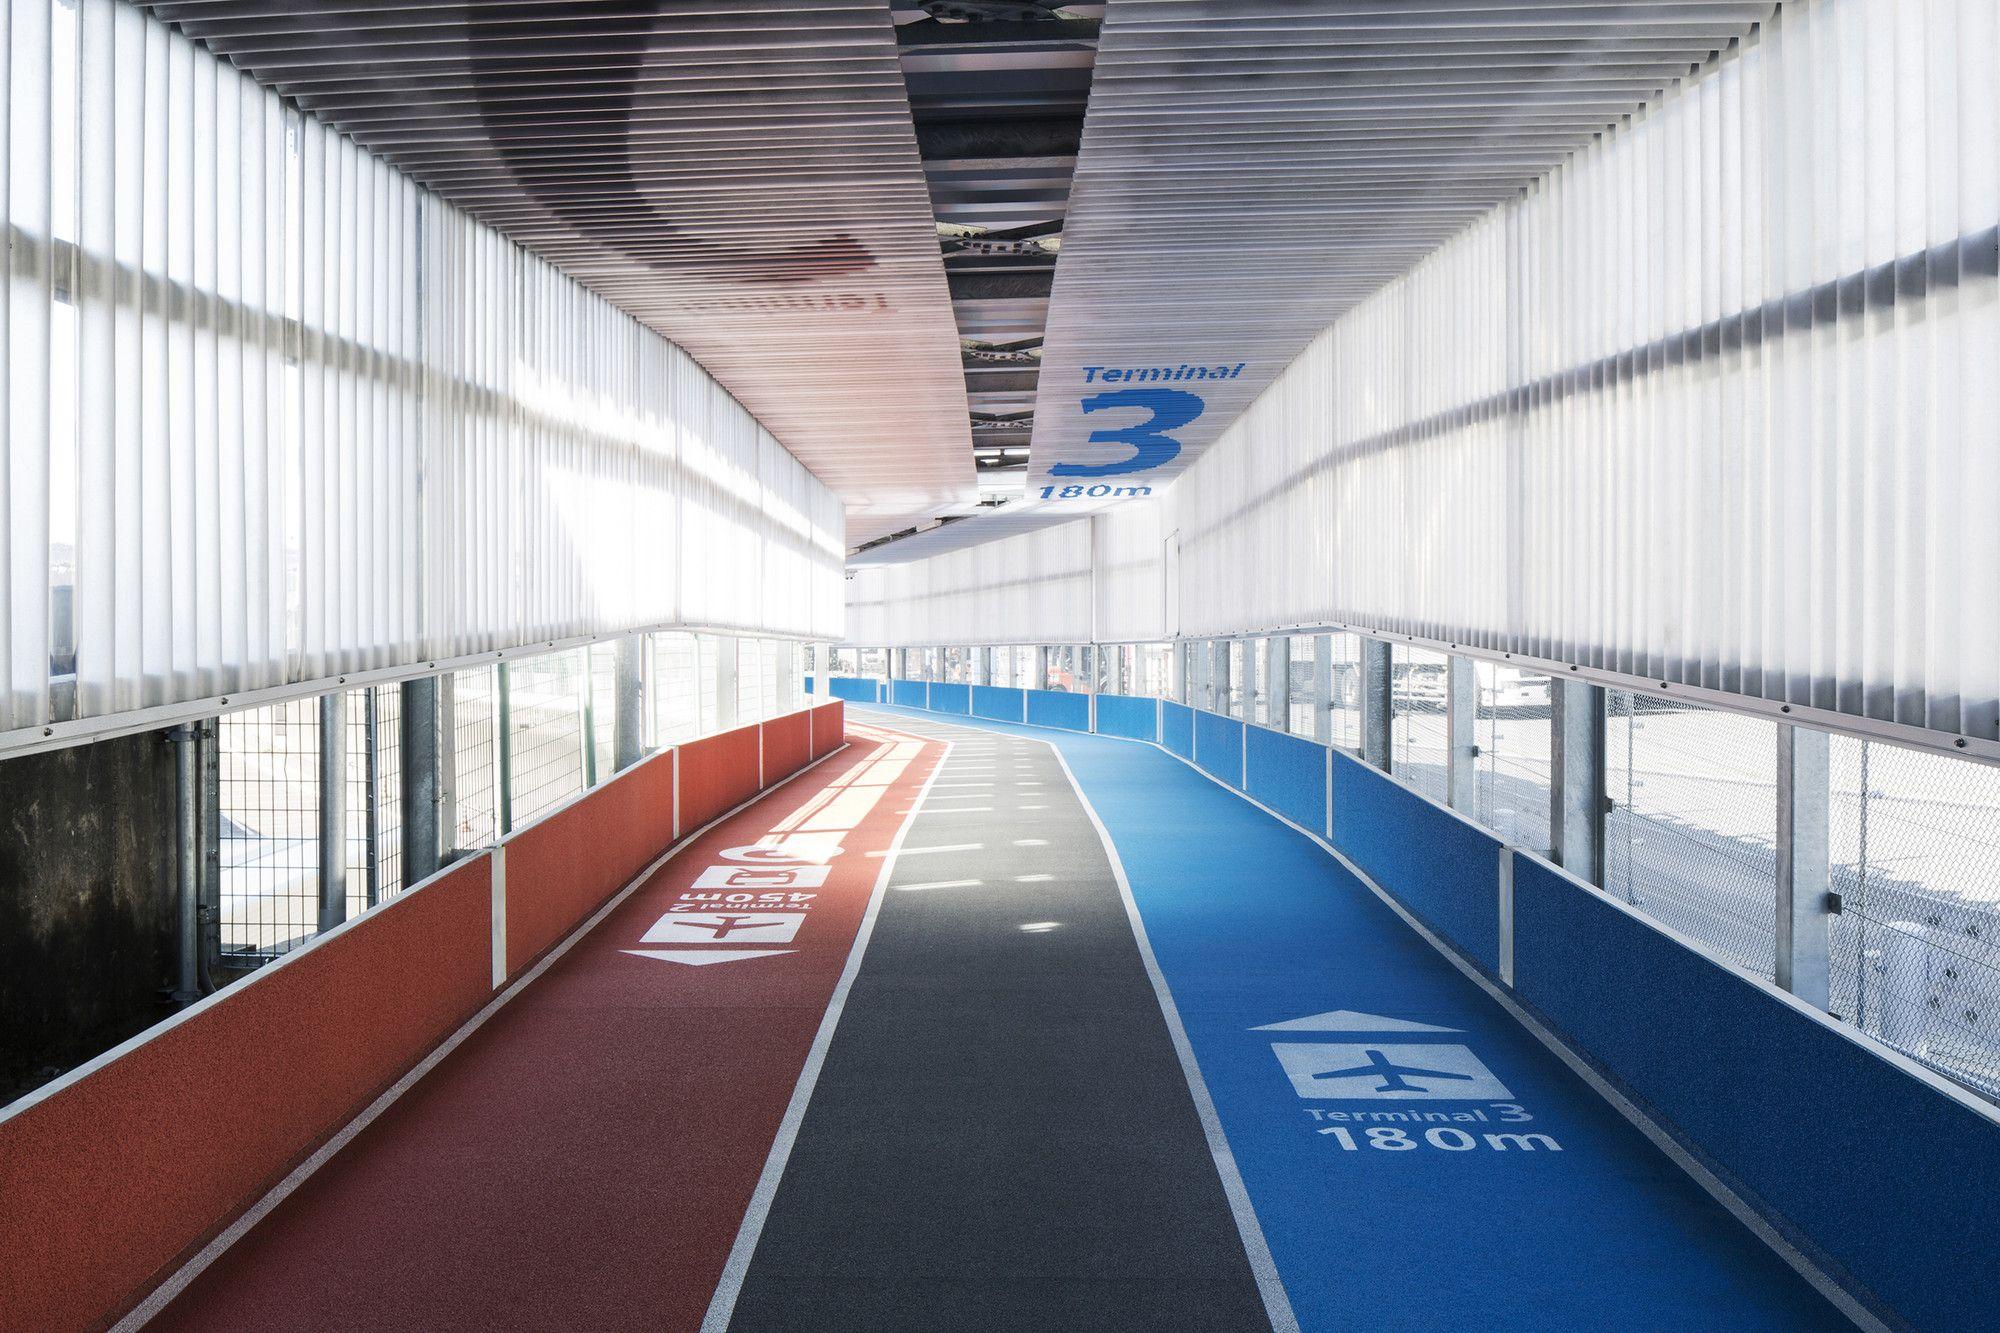 Gallery - Narita International Airport Terminal 3 / NIKKEN SEKKEI + Ryohin Keikaku + PARTY - 1